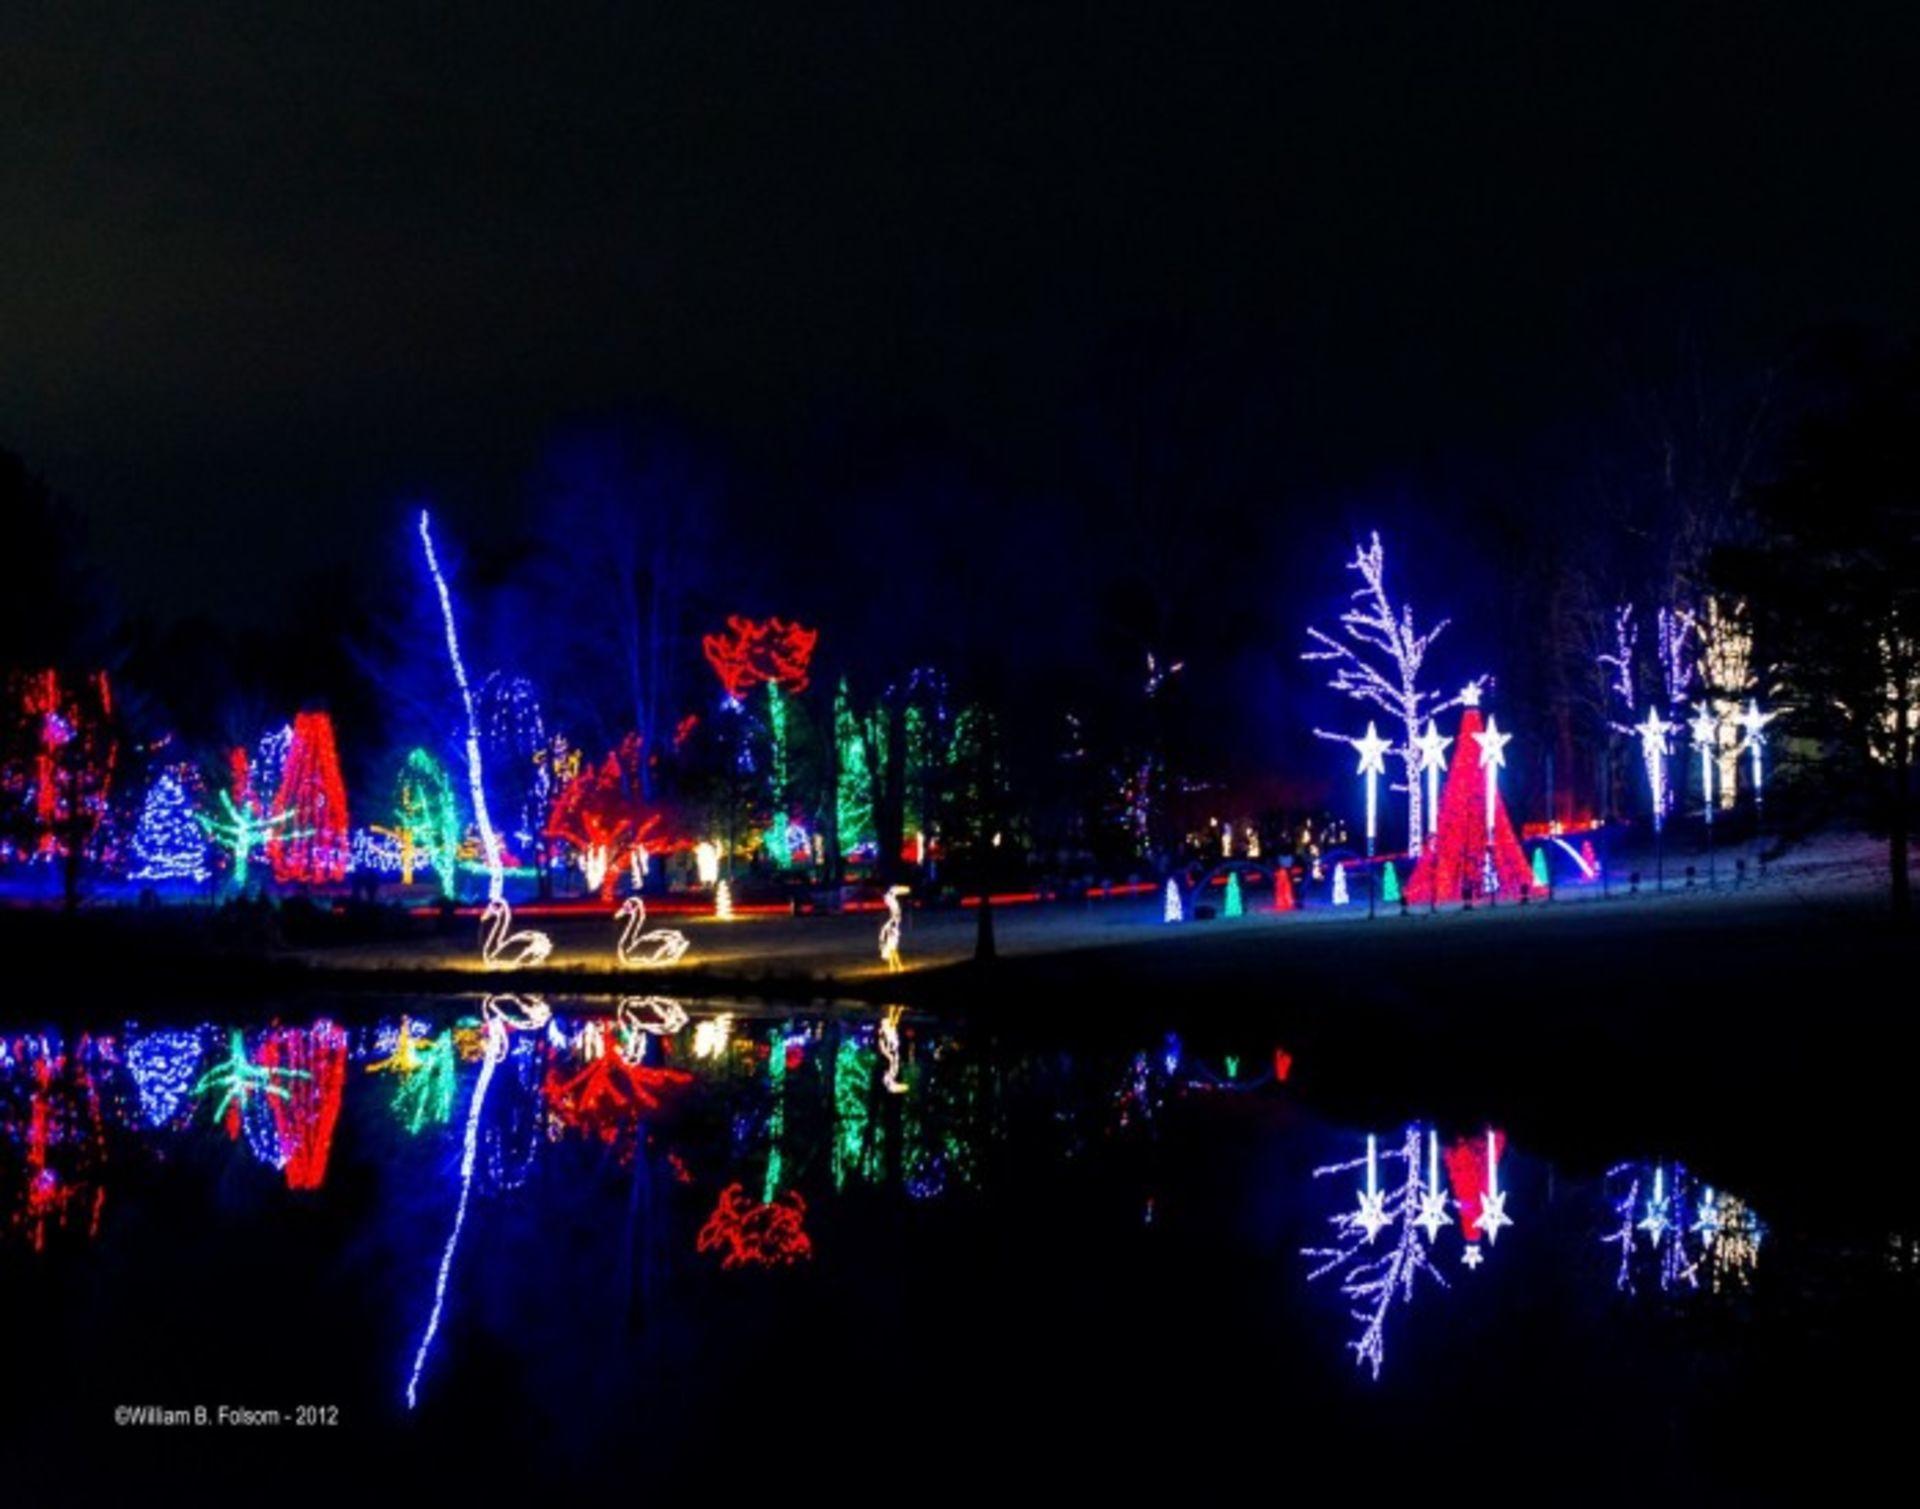 Best Christmas Light Displays in Northern Virginia